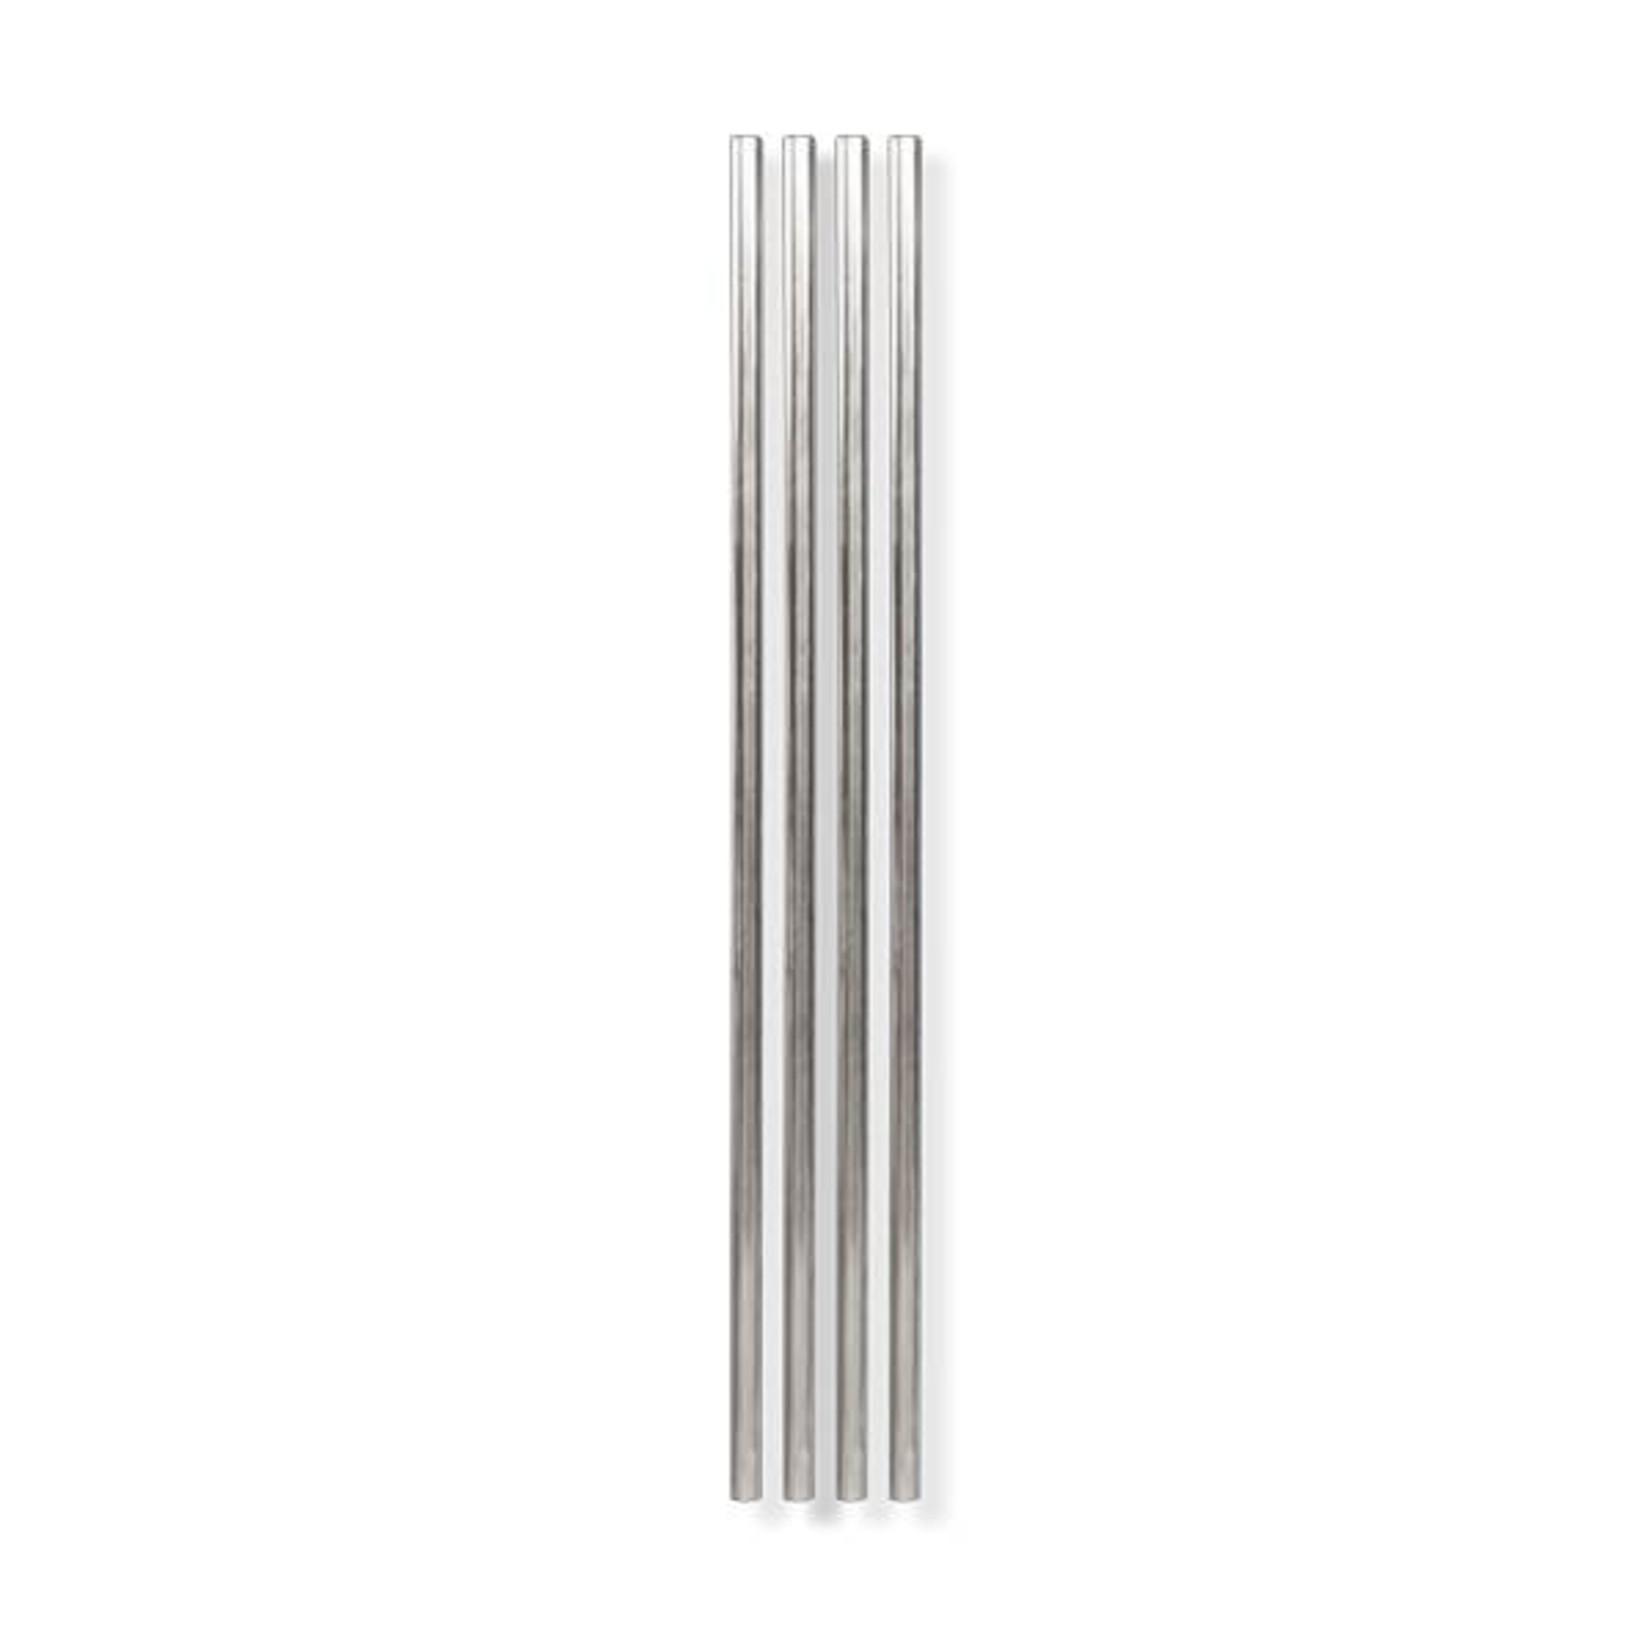 "Metal Straws 10"" - Set of 4 Silver"